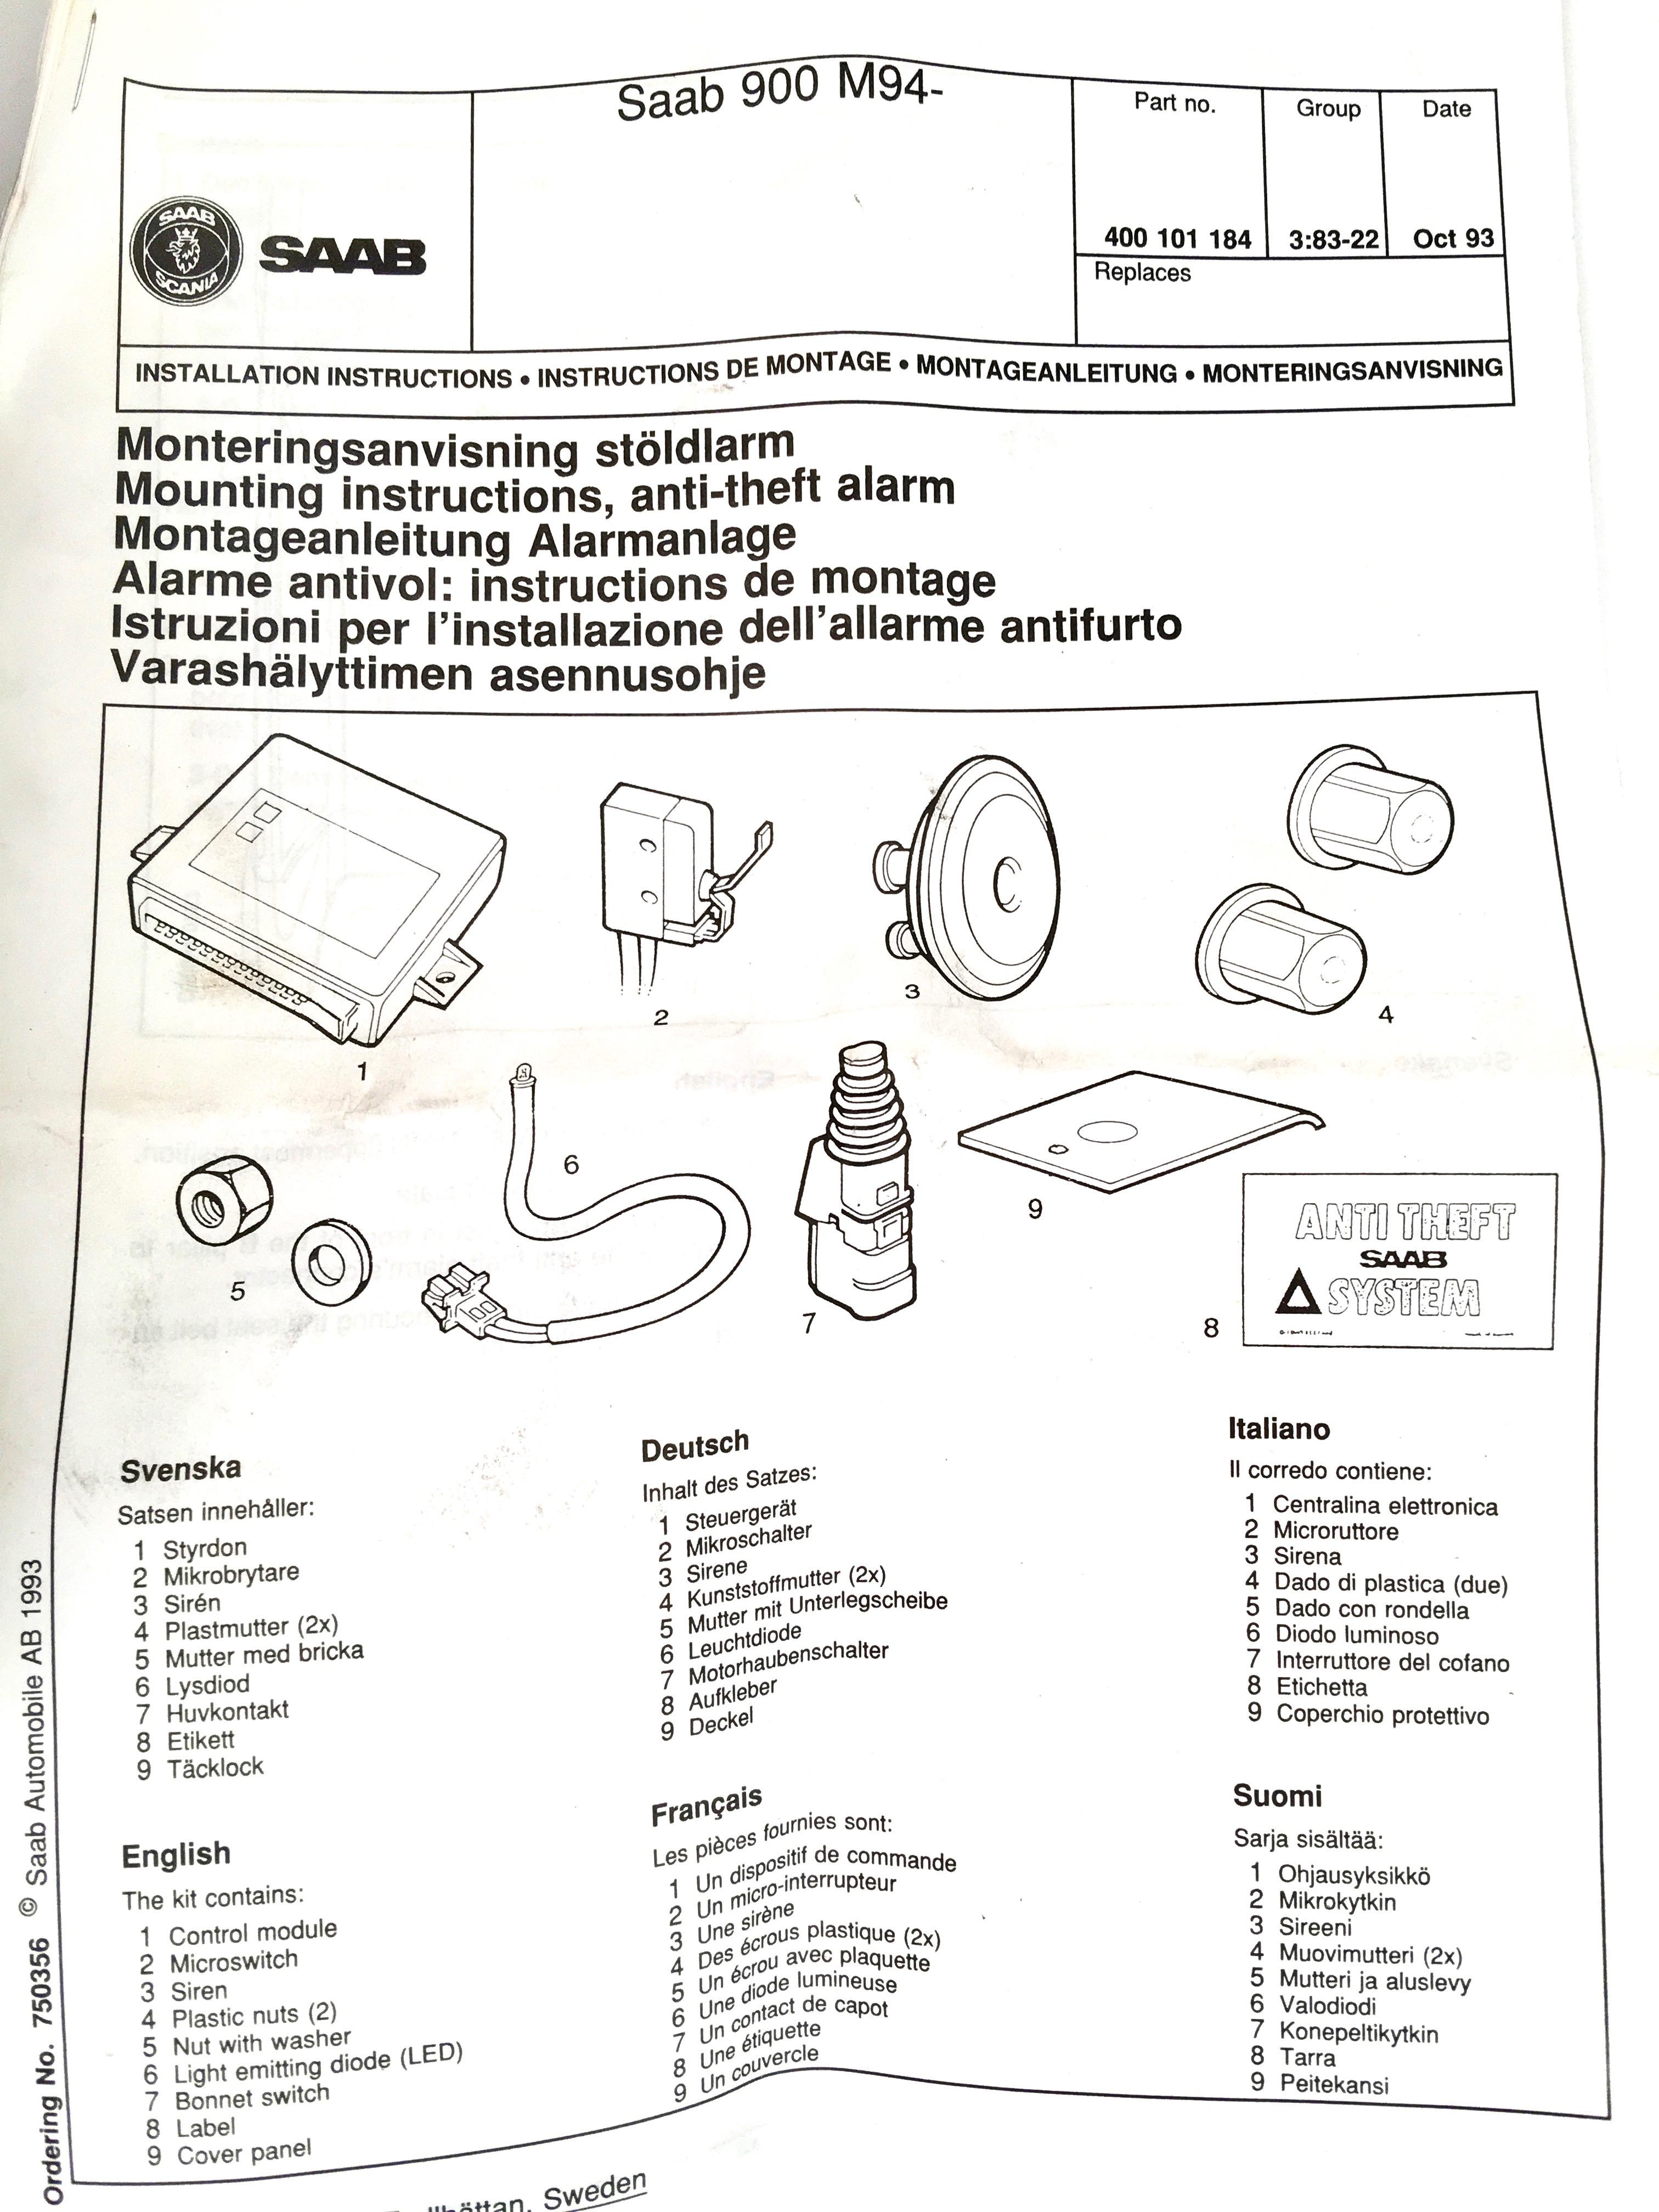 400101184 Anti theft system Saab 900